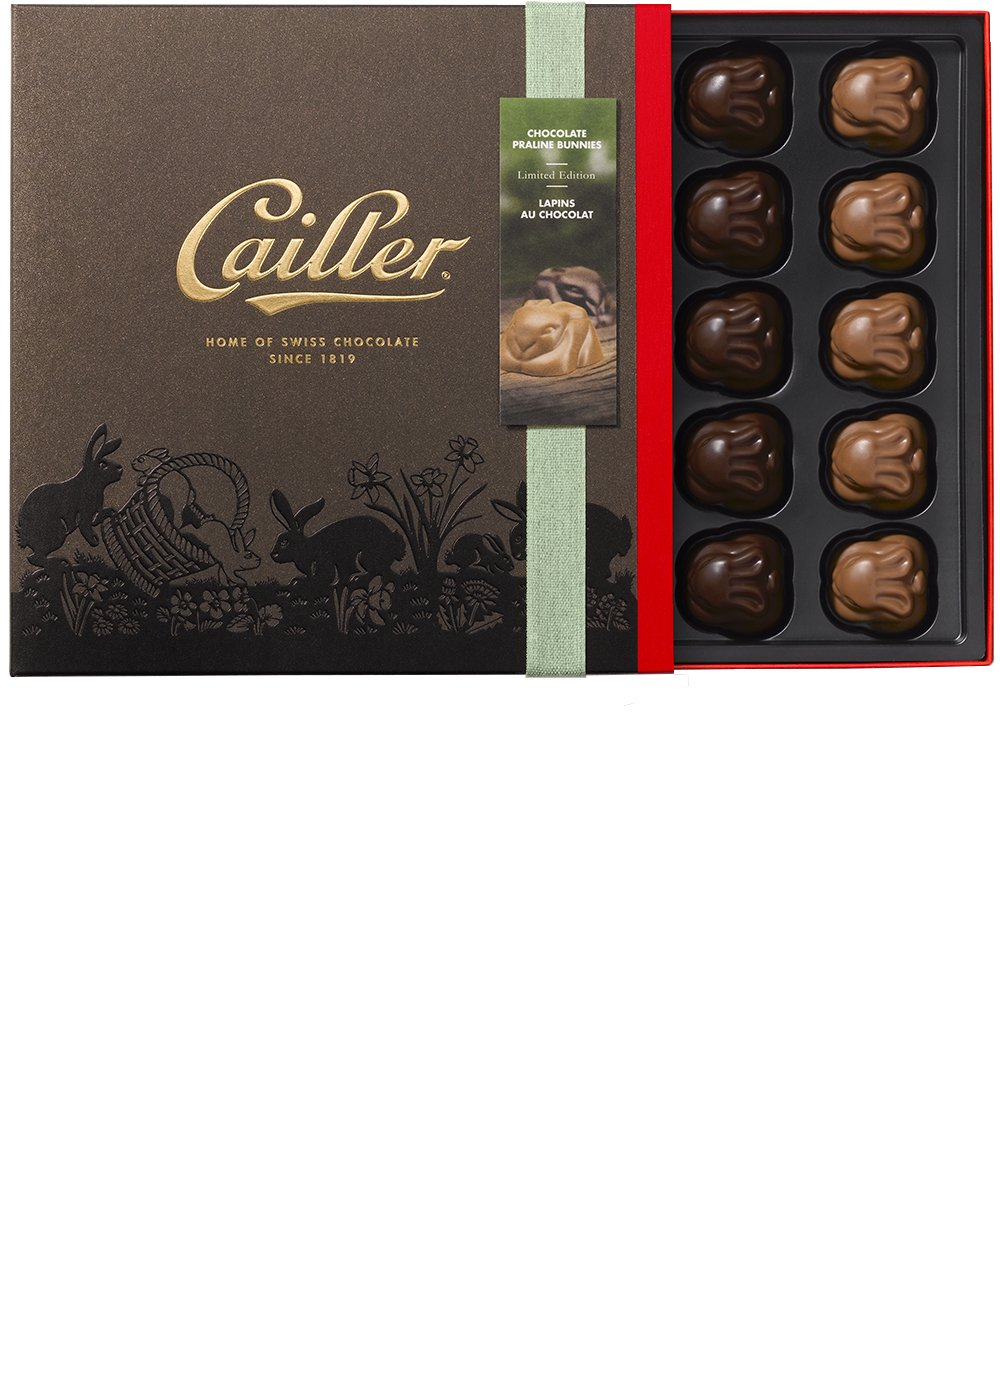 CAILLER Praline Bunnies Chocolate Assortment, 4.8 Ounce